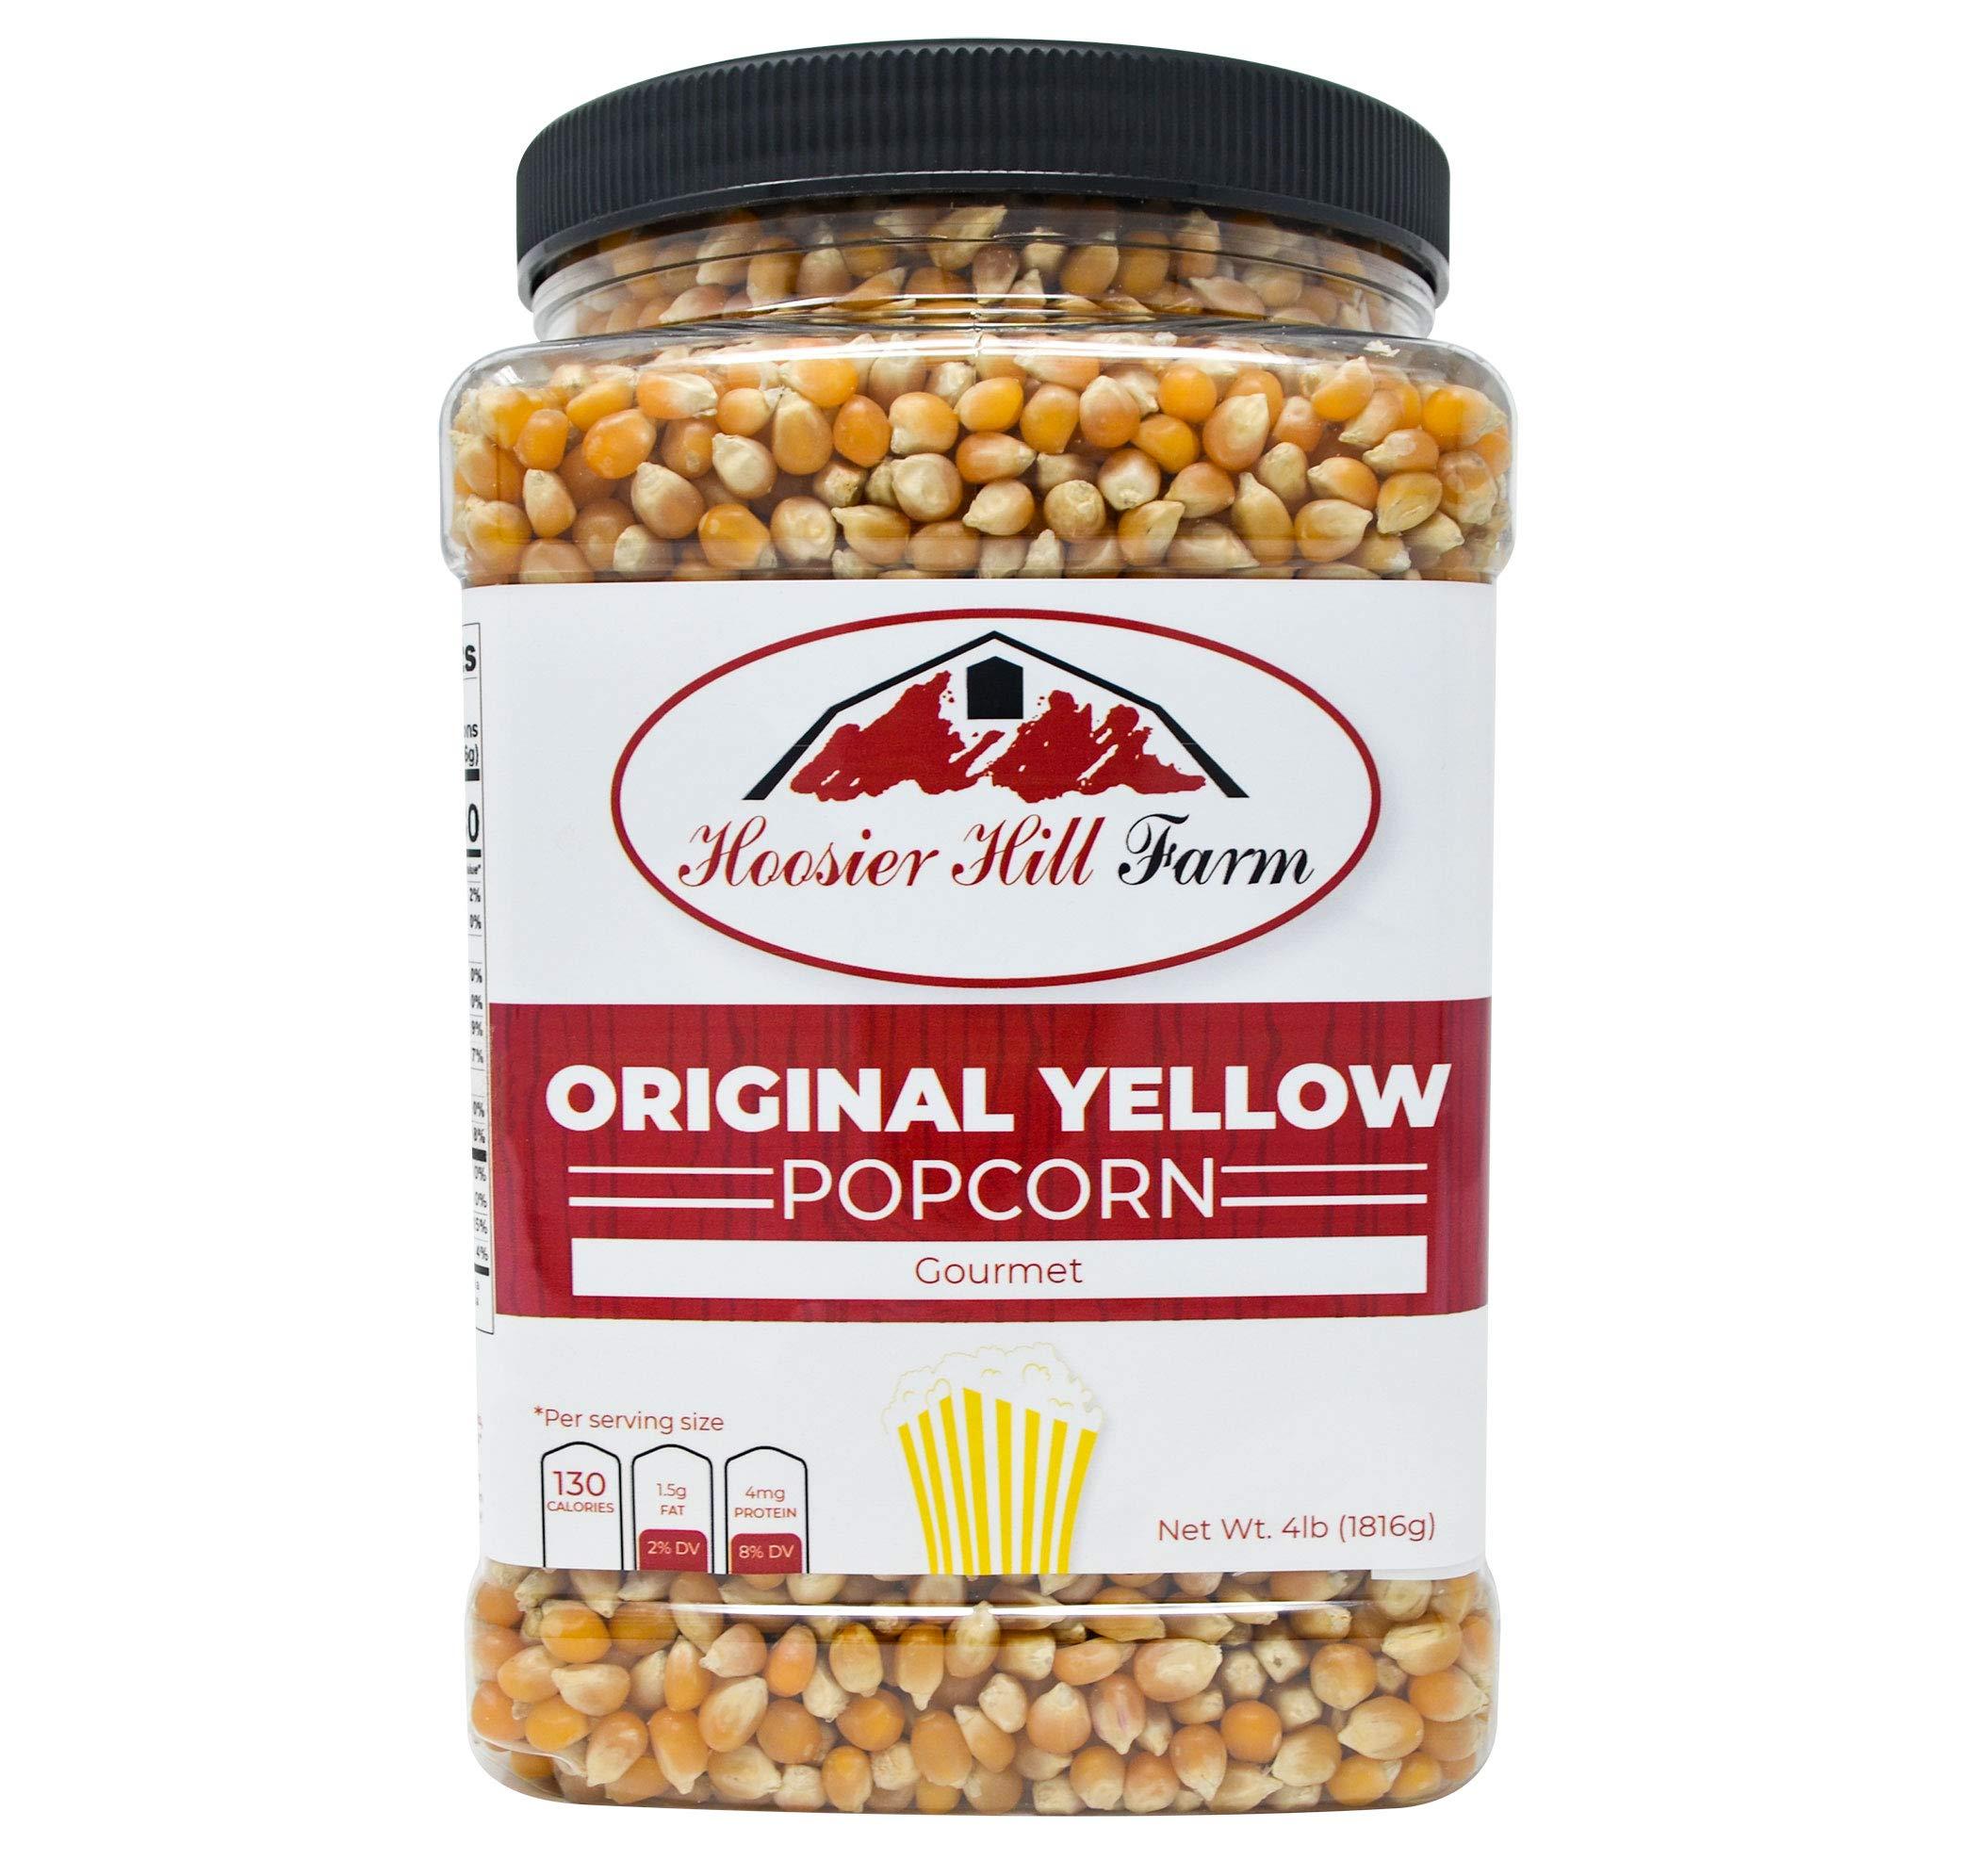 Hoosier Hill Farm Original Yellow, Popcorn Lovers 4 lb. Jar. by Hoosier Hill Farm LLC